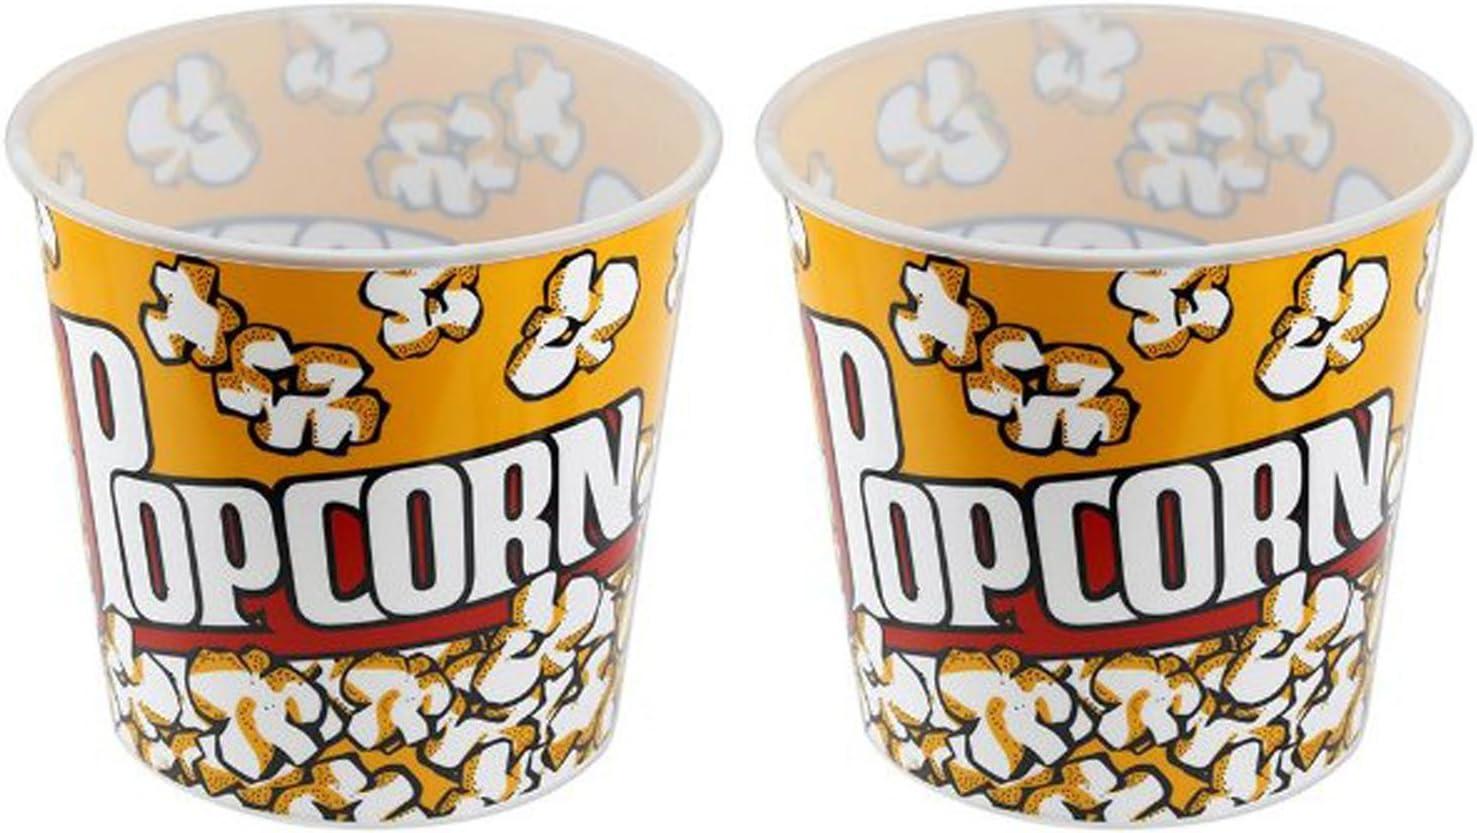 Popcorn Serving Tub Large 7.5